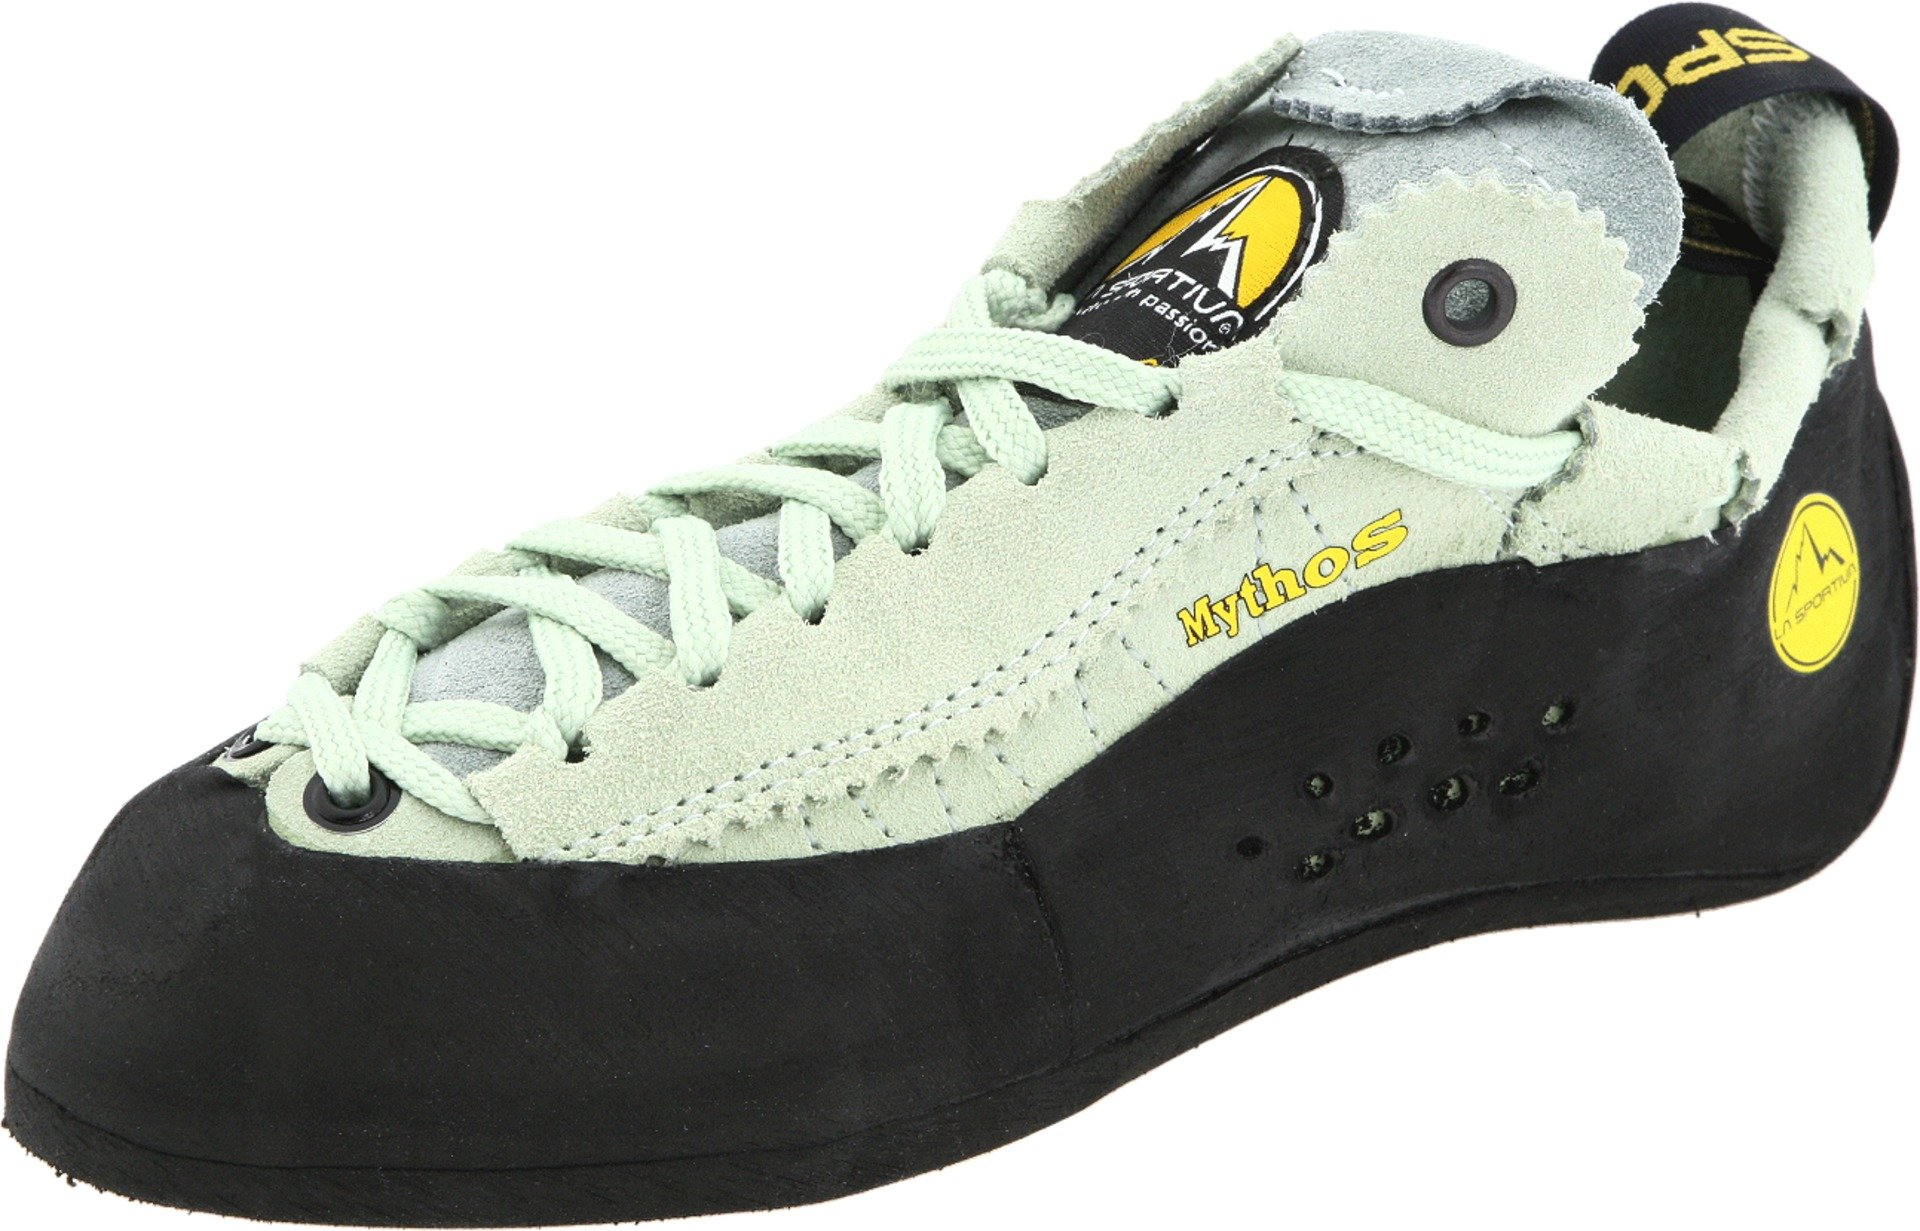 La Sportiva Mythos Lace-Up Climbing Shoe - Women's, Pistachio, 34 EU by La Sportiva